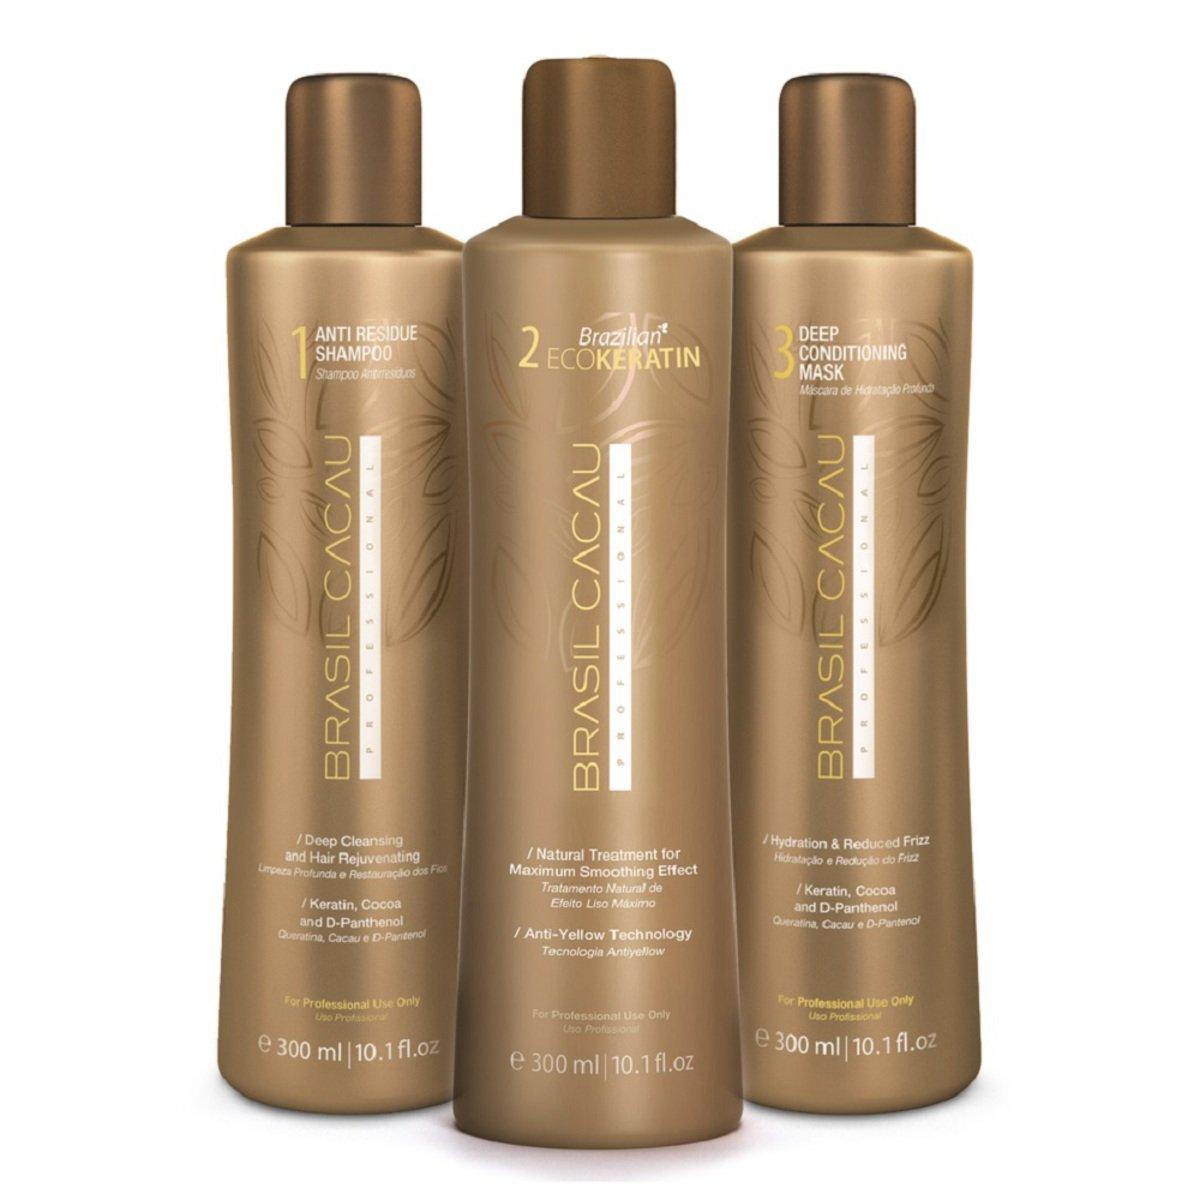 Buy Brasil Cacau Eco Keratin Brazilian Keratin Treatment Blow Dry Hair Straightening Online At Low Prices In India Amazon In